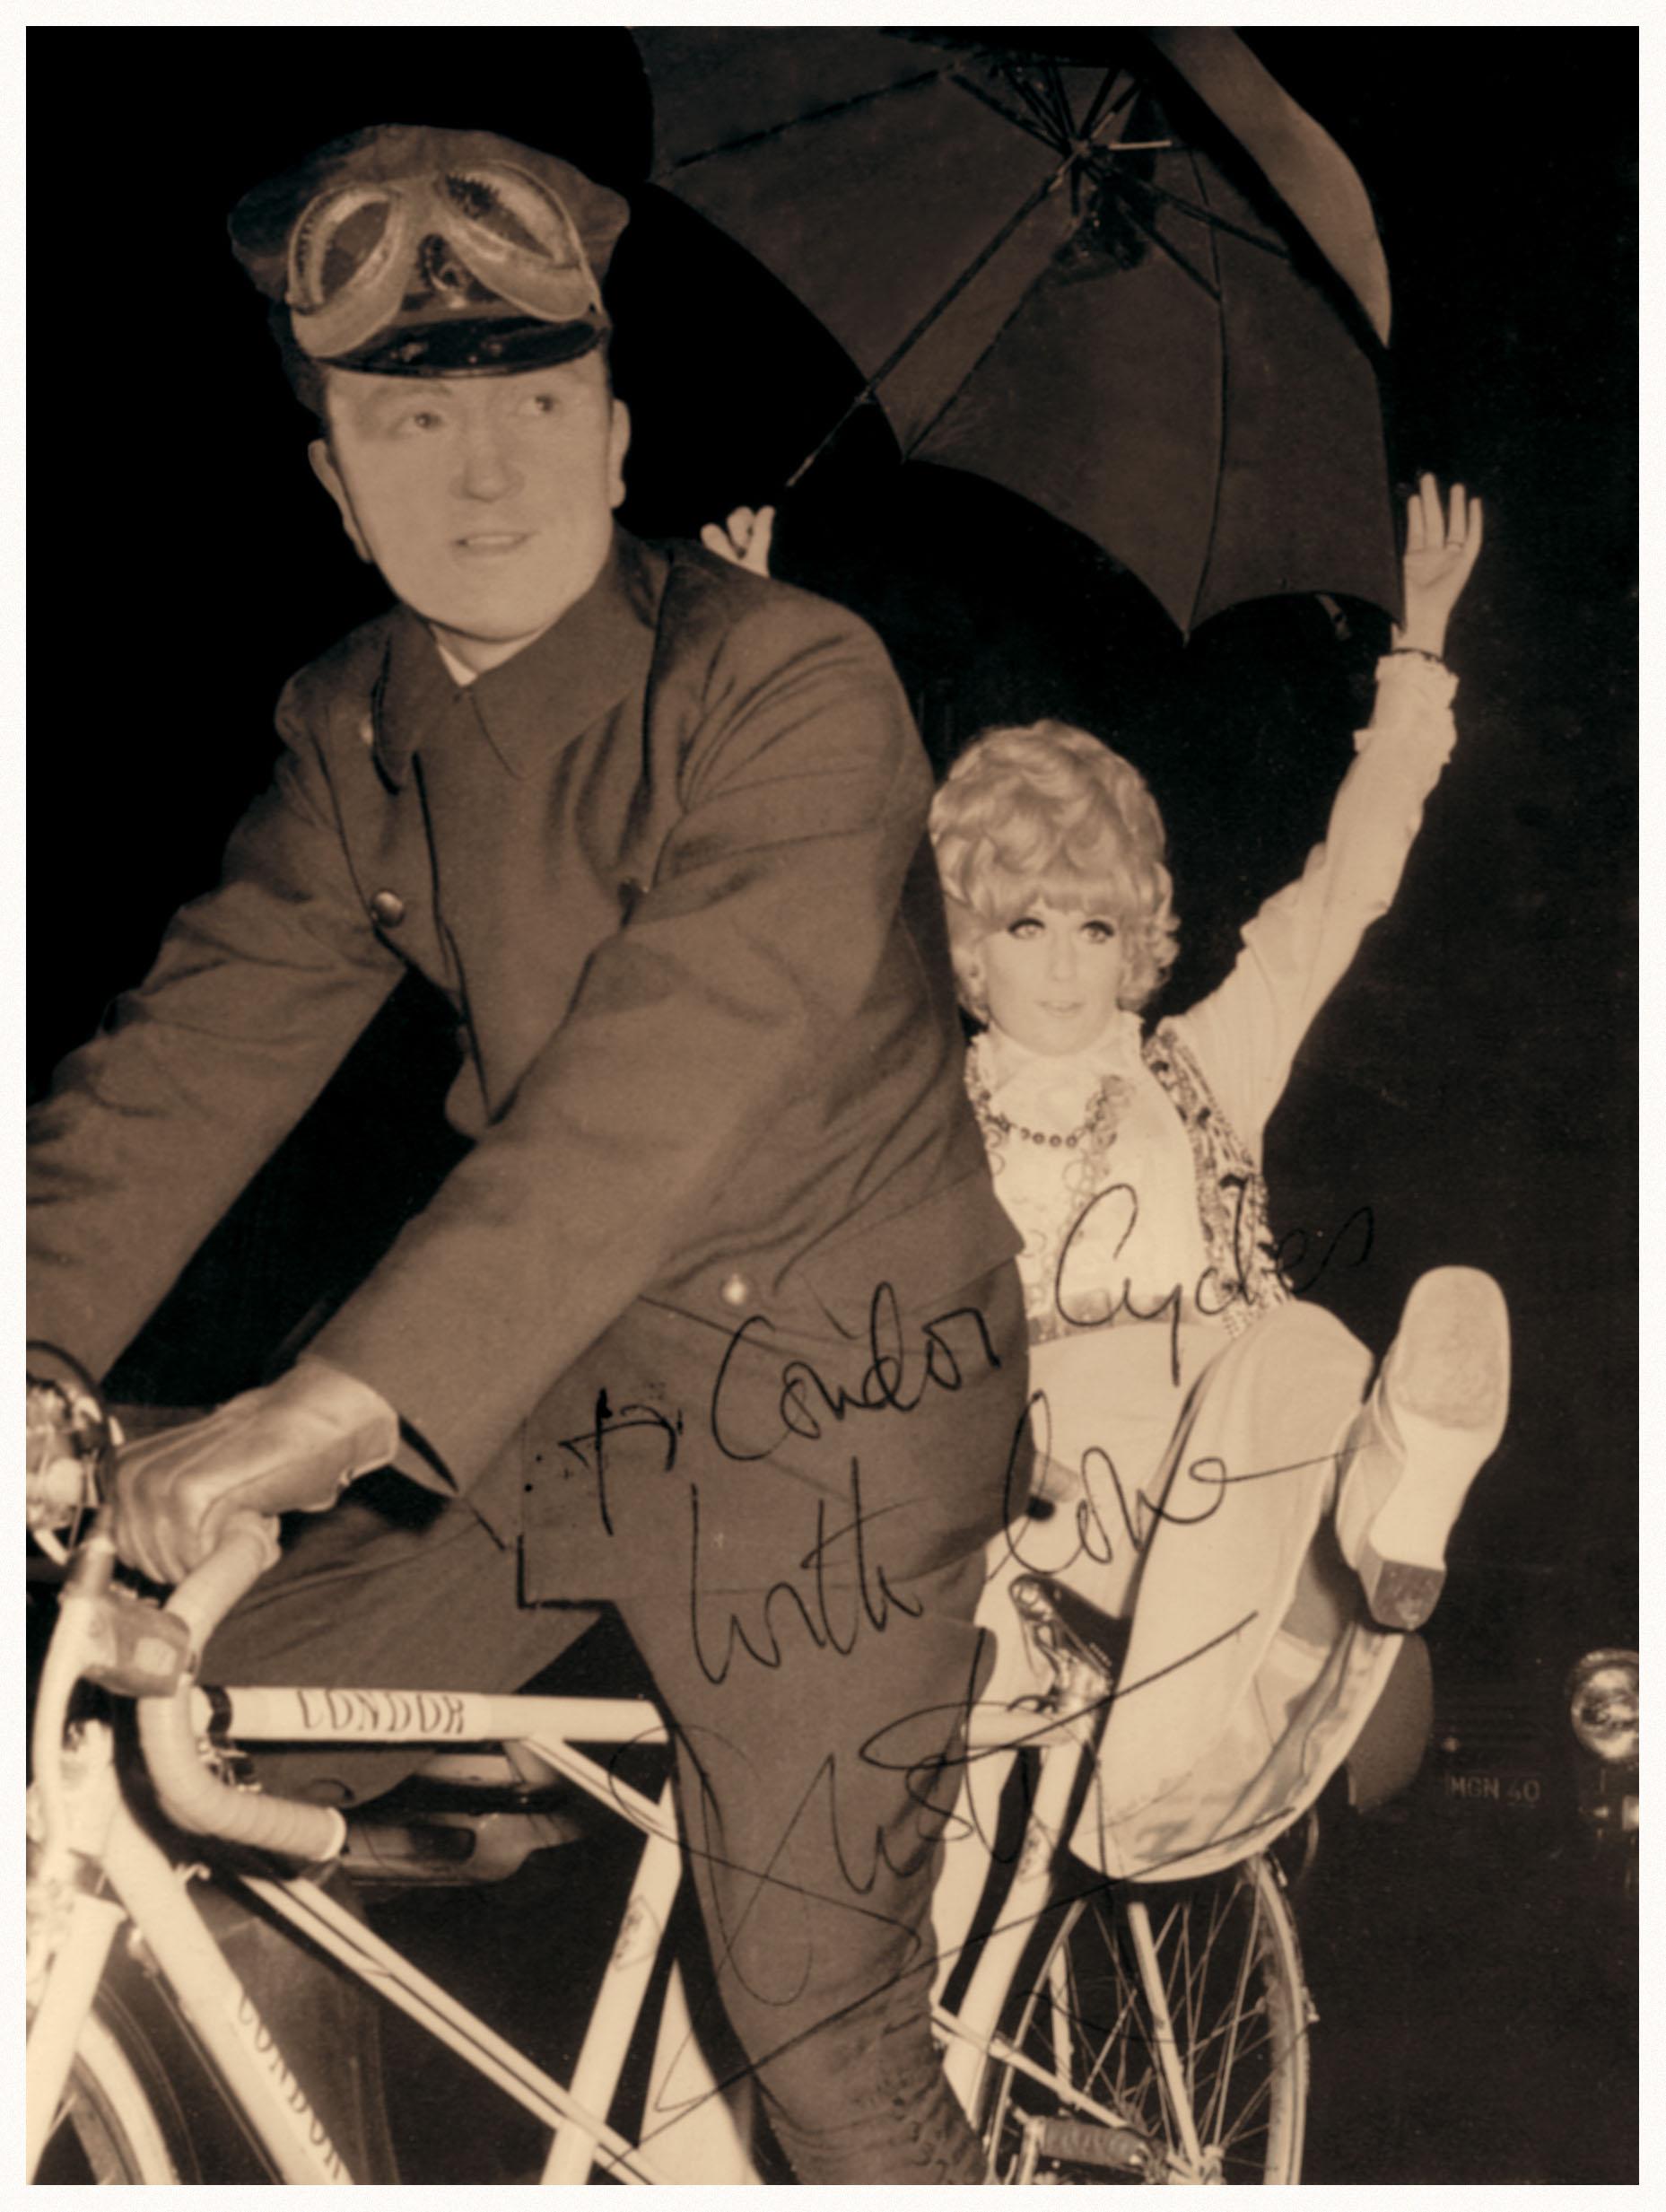 Dusty_Springfield_Alan_Dunn womens cycling.jpg